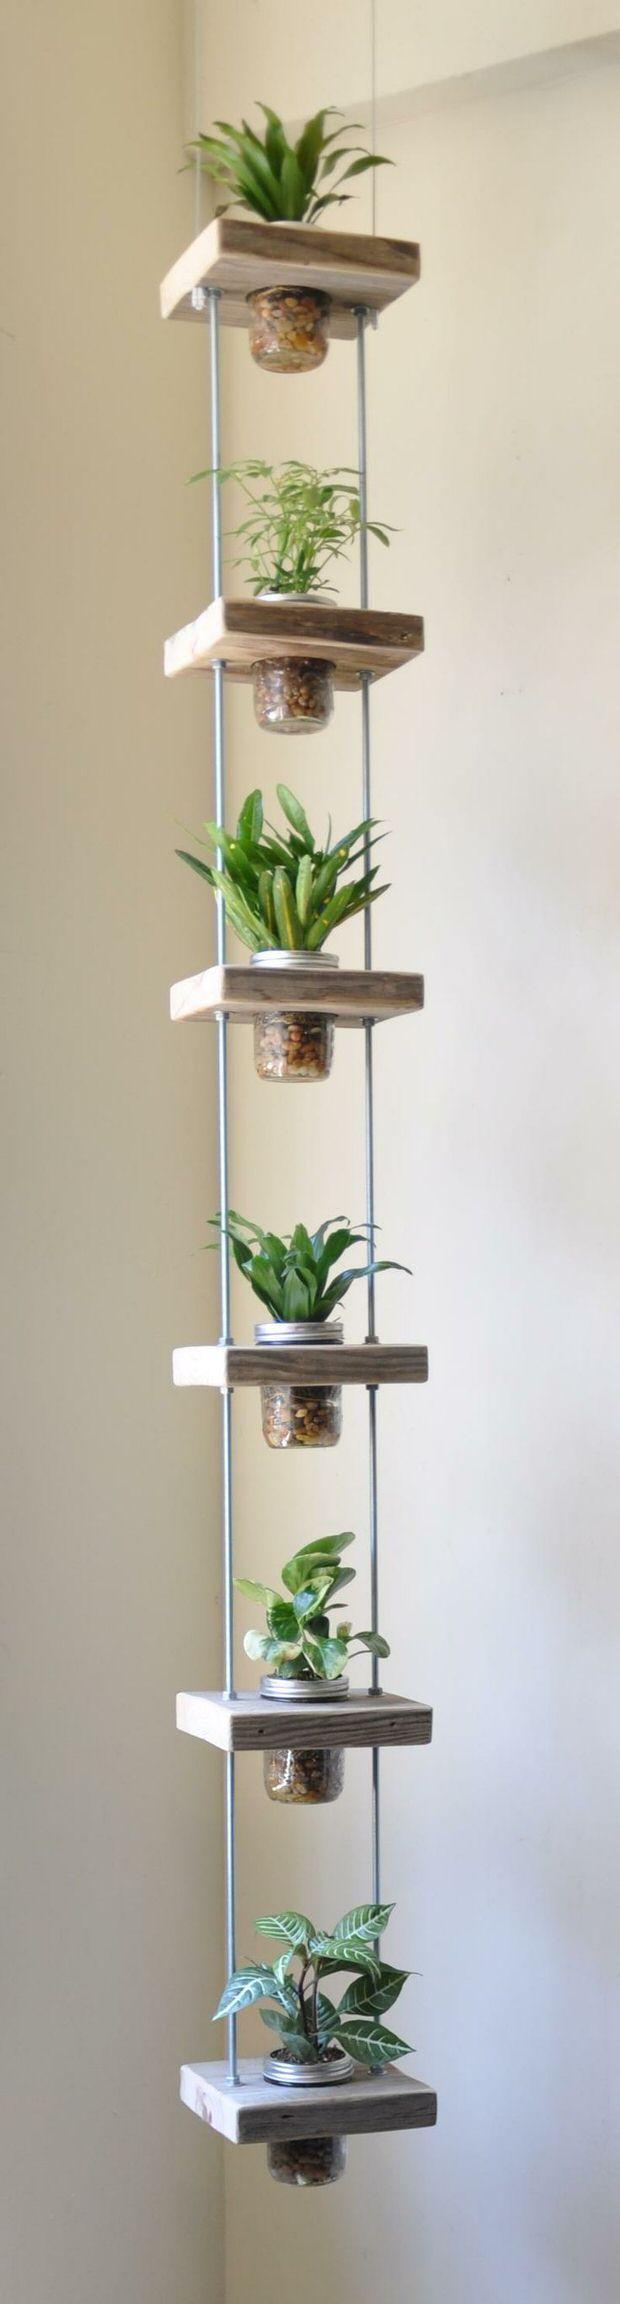 Indoor Vertical Wall Garden Ideas Pictures, Photos, and ...